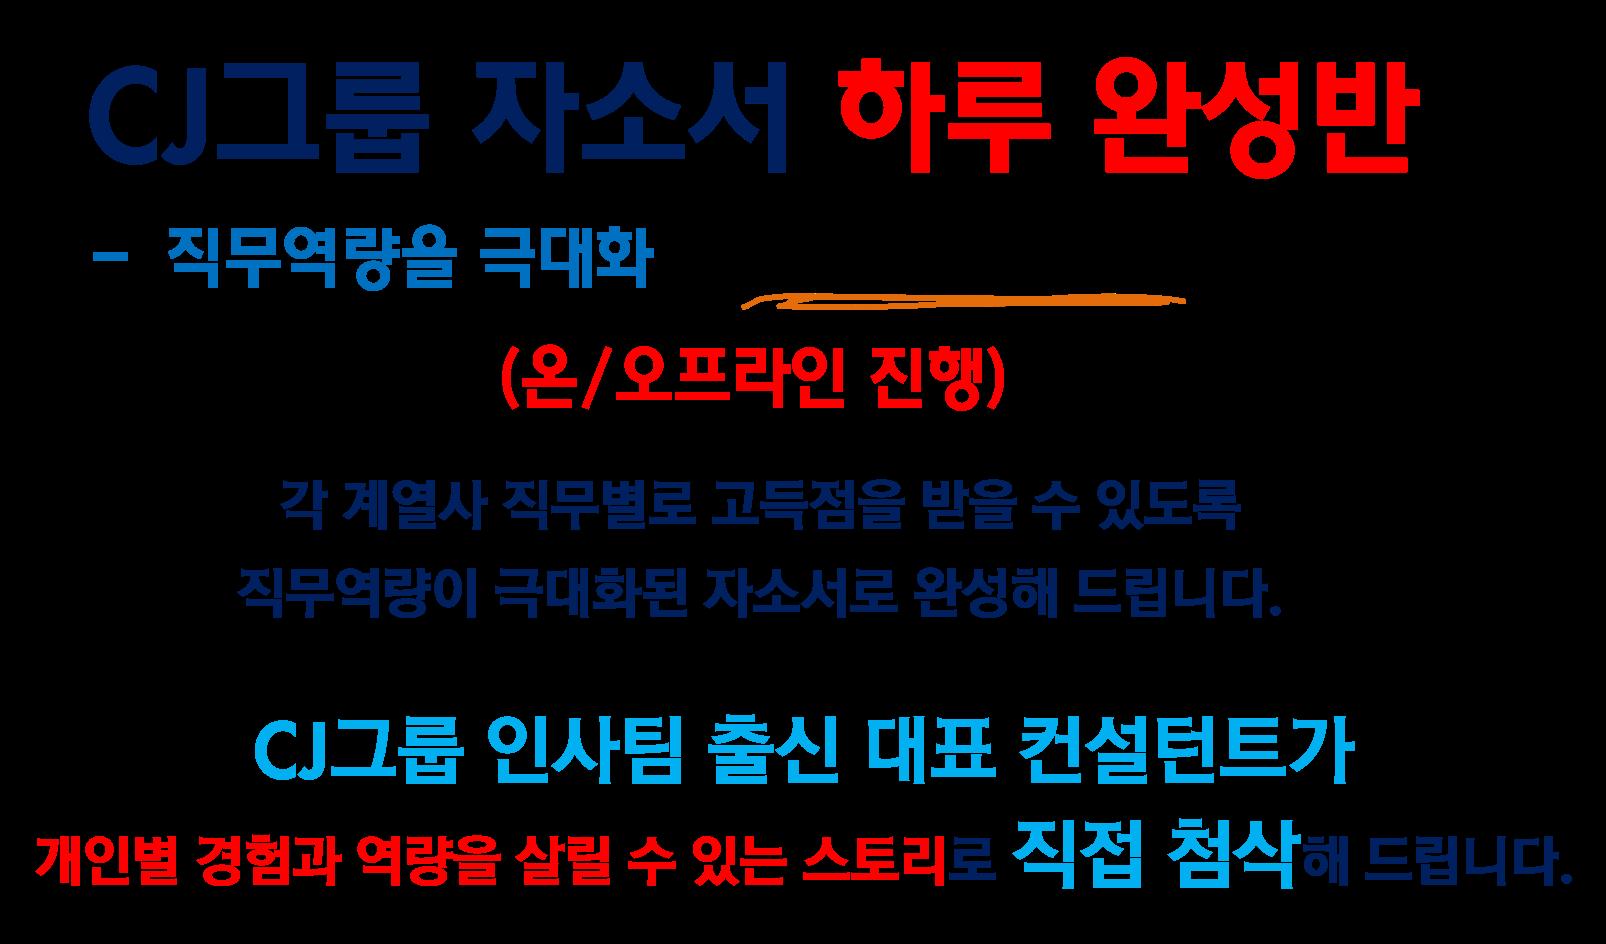 CJ자소서첨삭반_커리어비전01.png